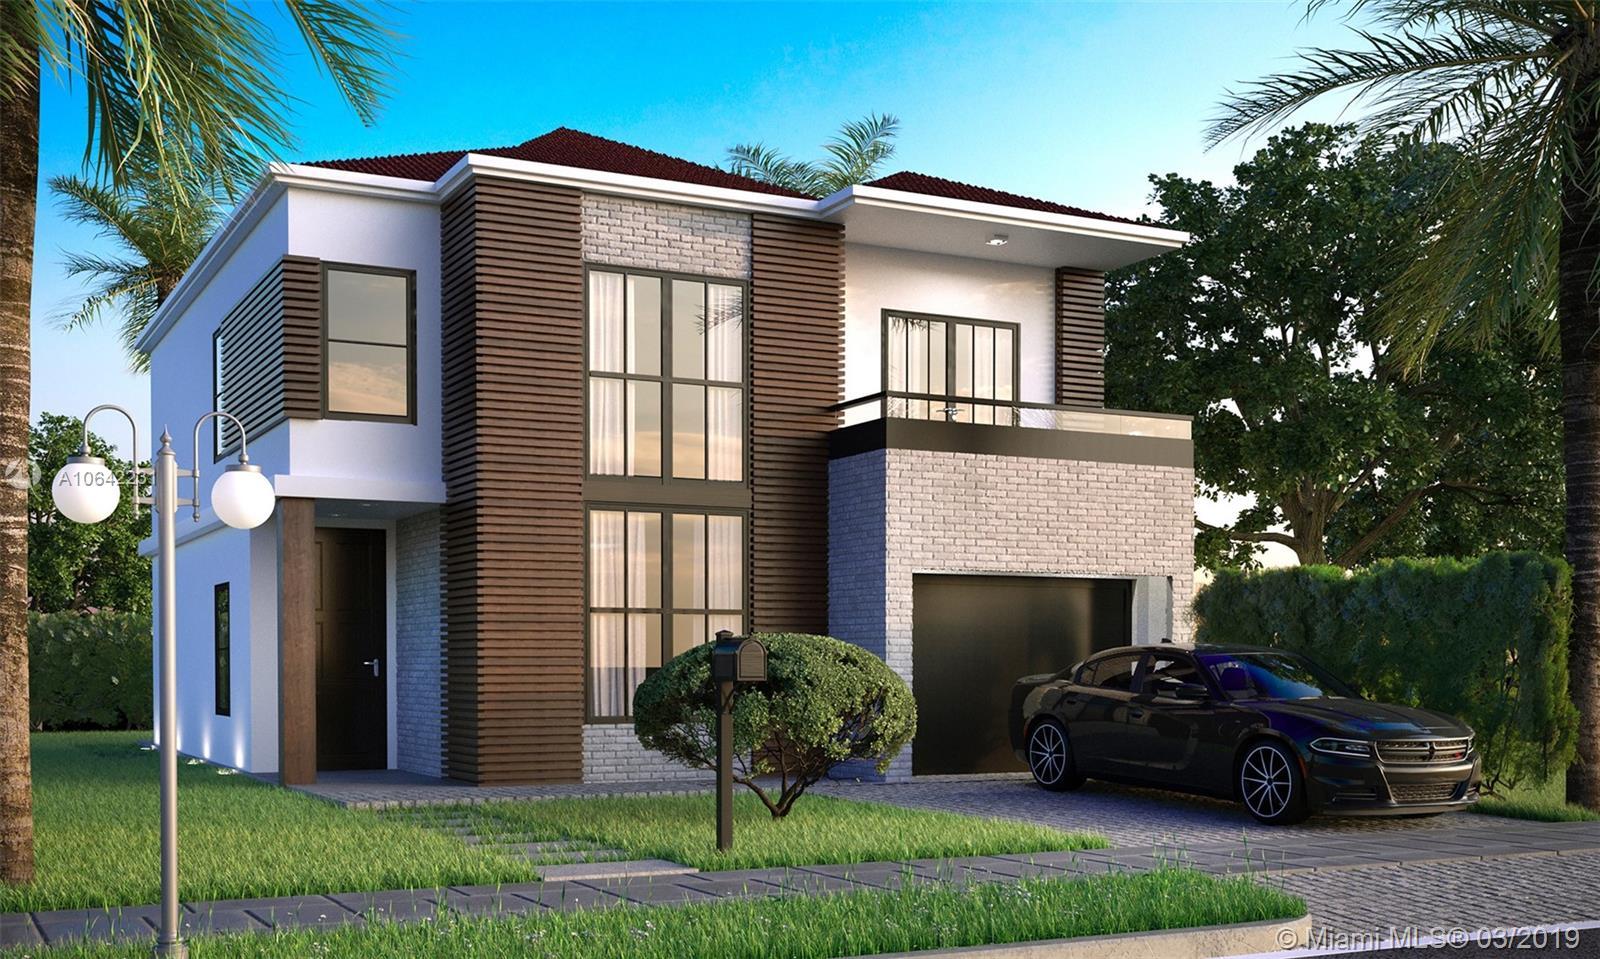 1100 W Palm Drive, Florida City, FL 33034 - Florida City, FL real estate listing